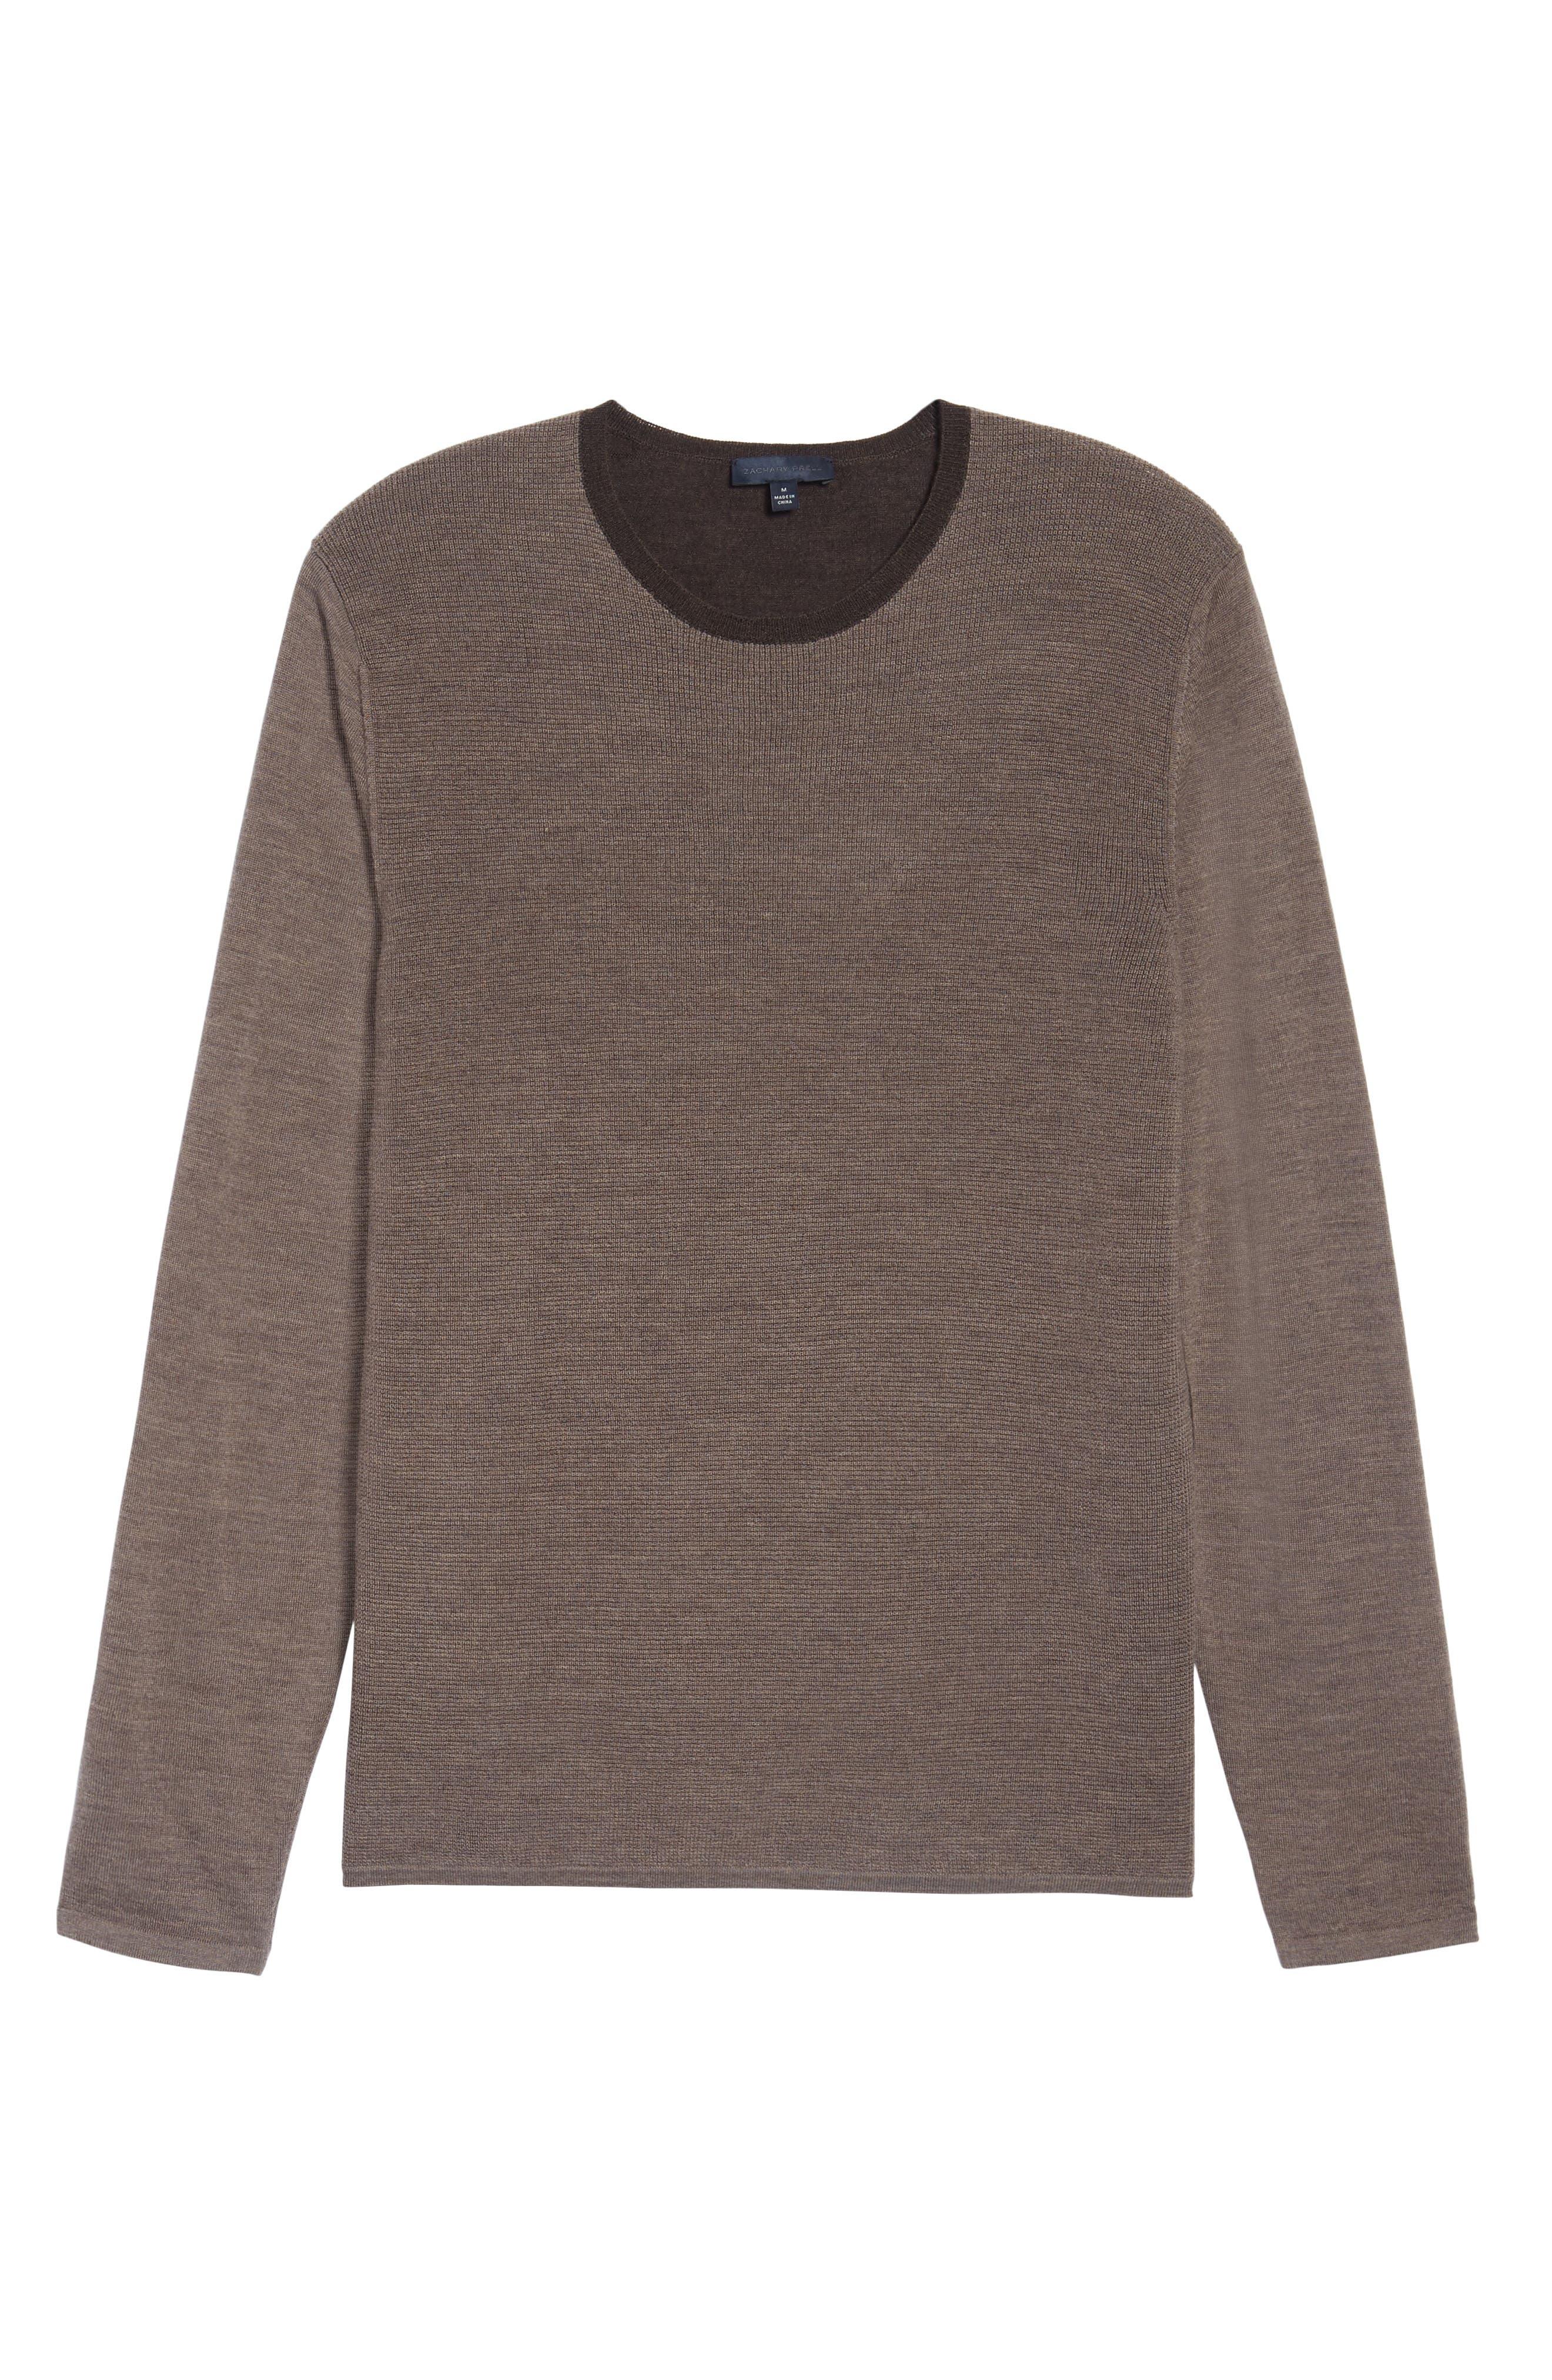 Huxley Merino Sweater,                             Alternate thumbnail 6, color,                             LIGHT COFFEE